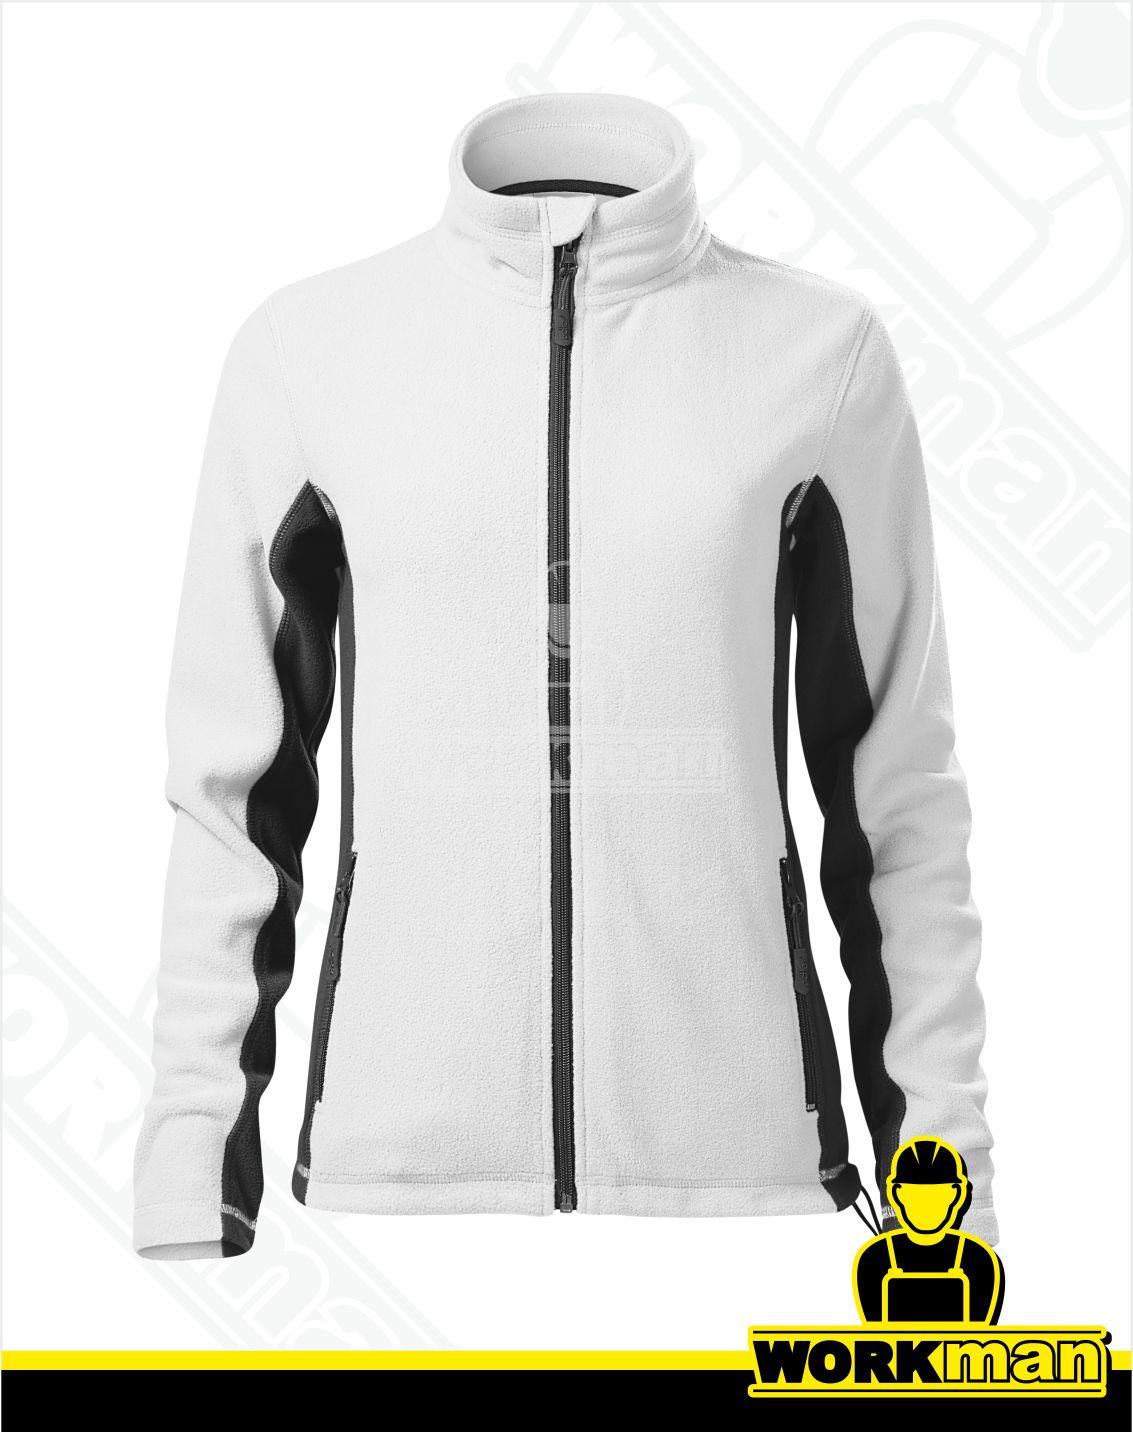 d85c3d1be Dámska fleece bunda FROSTY Malfini biela Pracovné odevy Workman